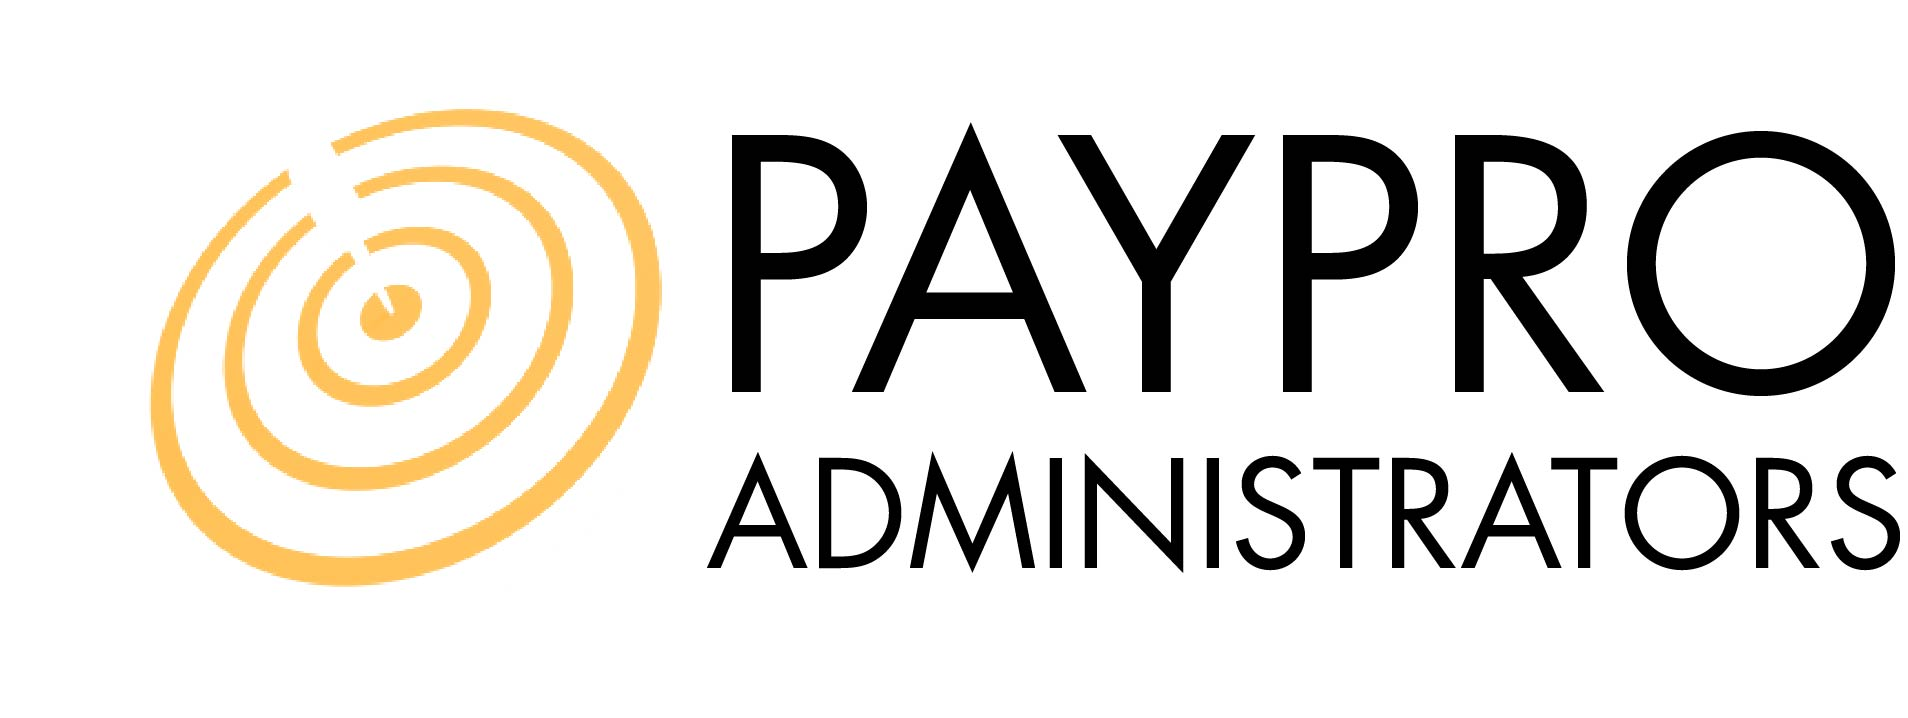 PayProLogo.jpg